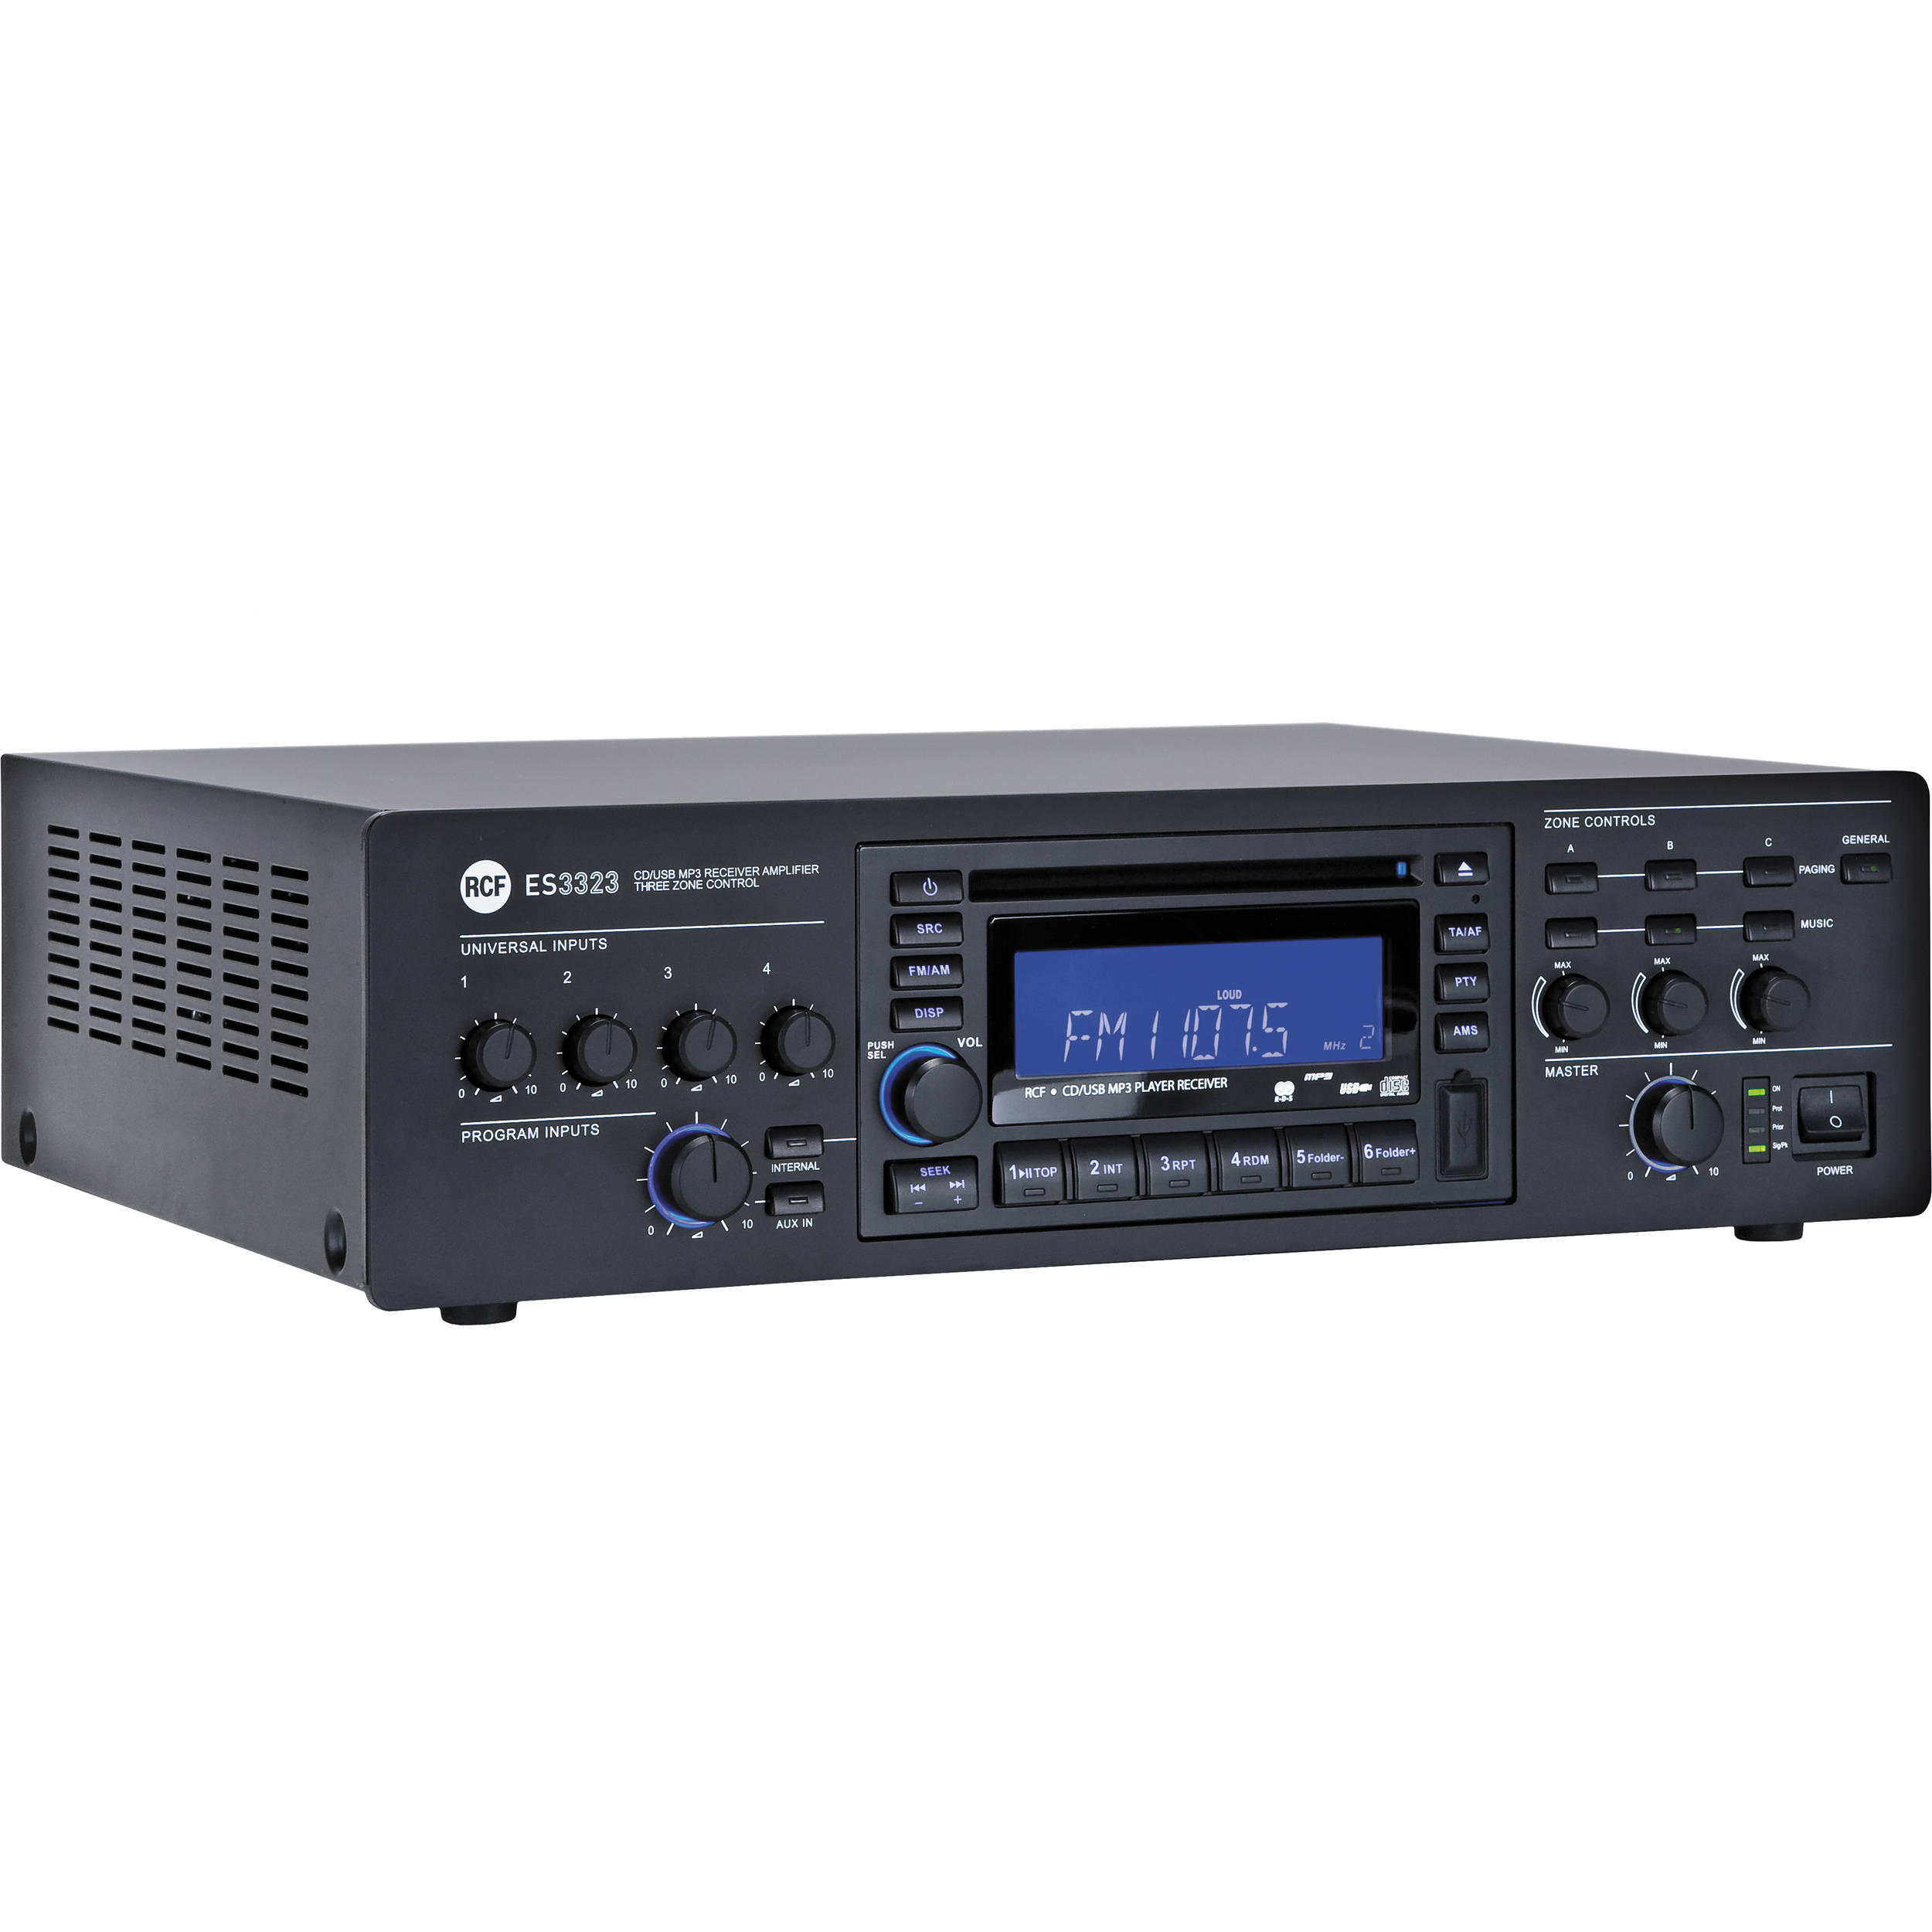 Microwaves1Mixers